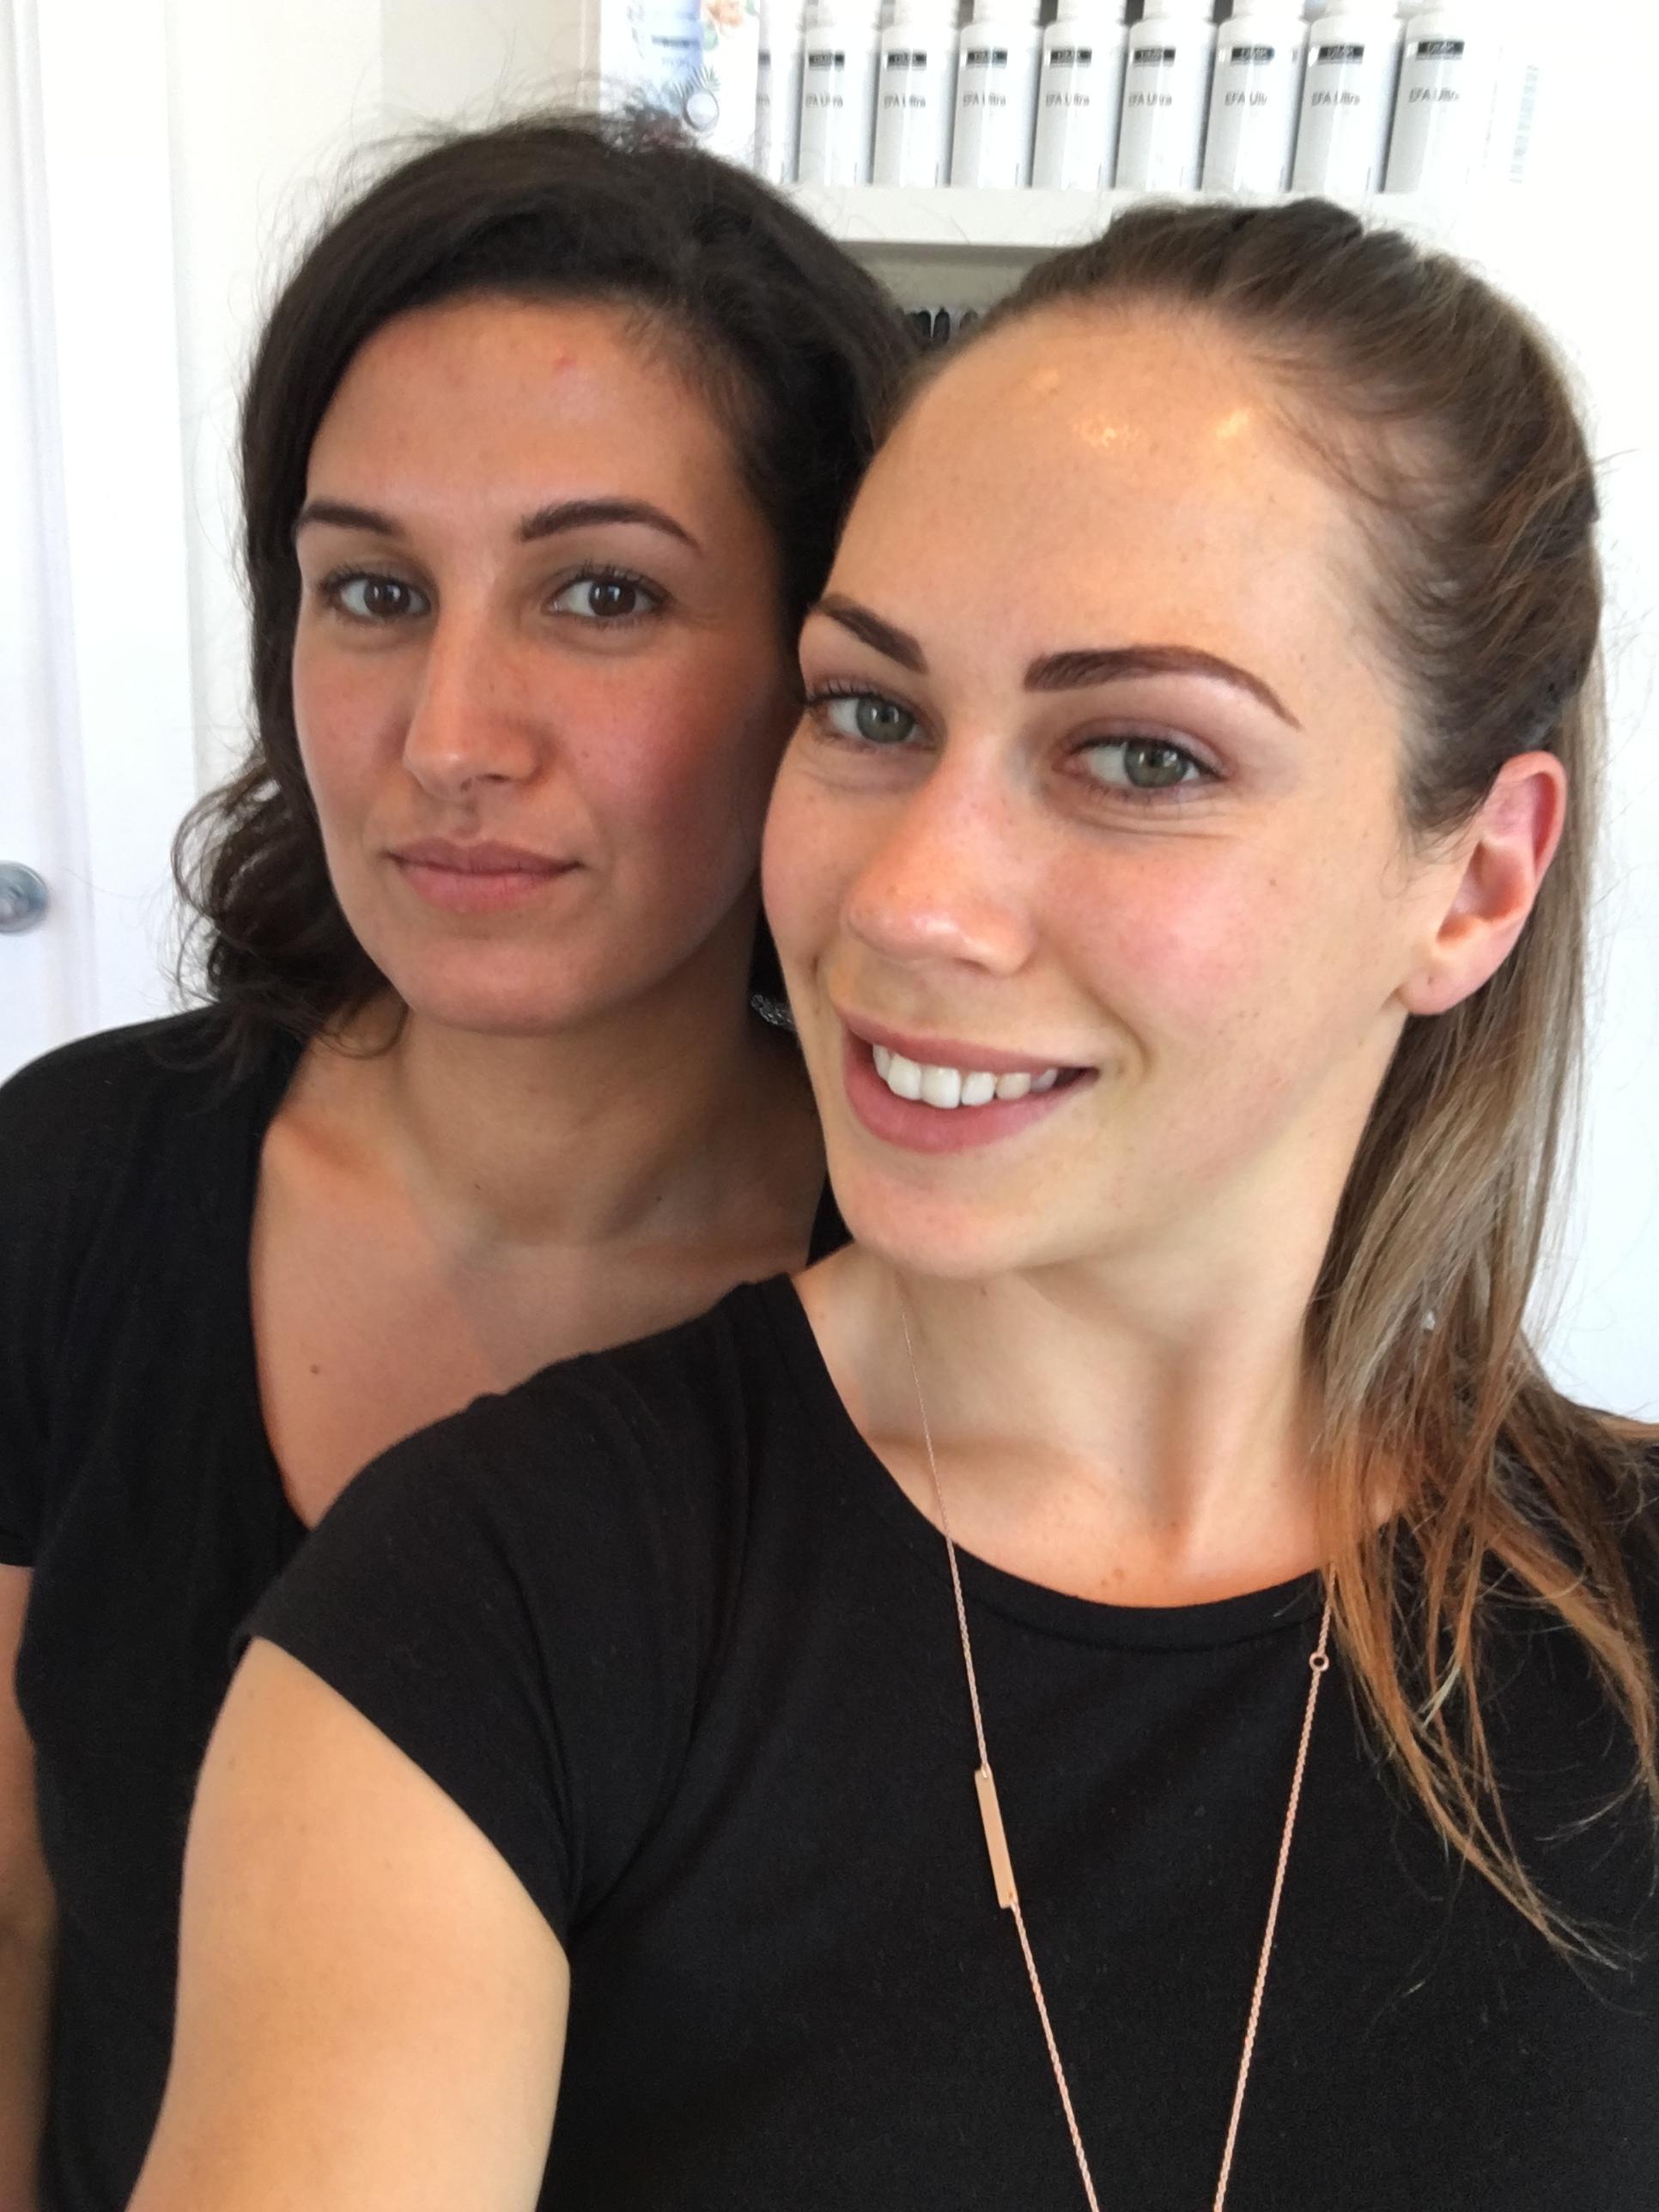 Foundation Free Skin Therapist Selfie